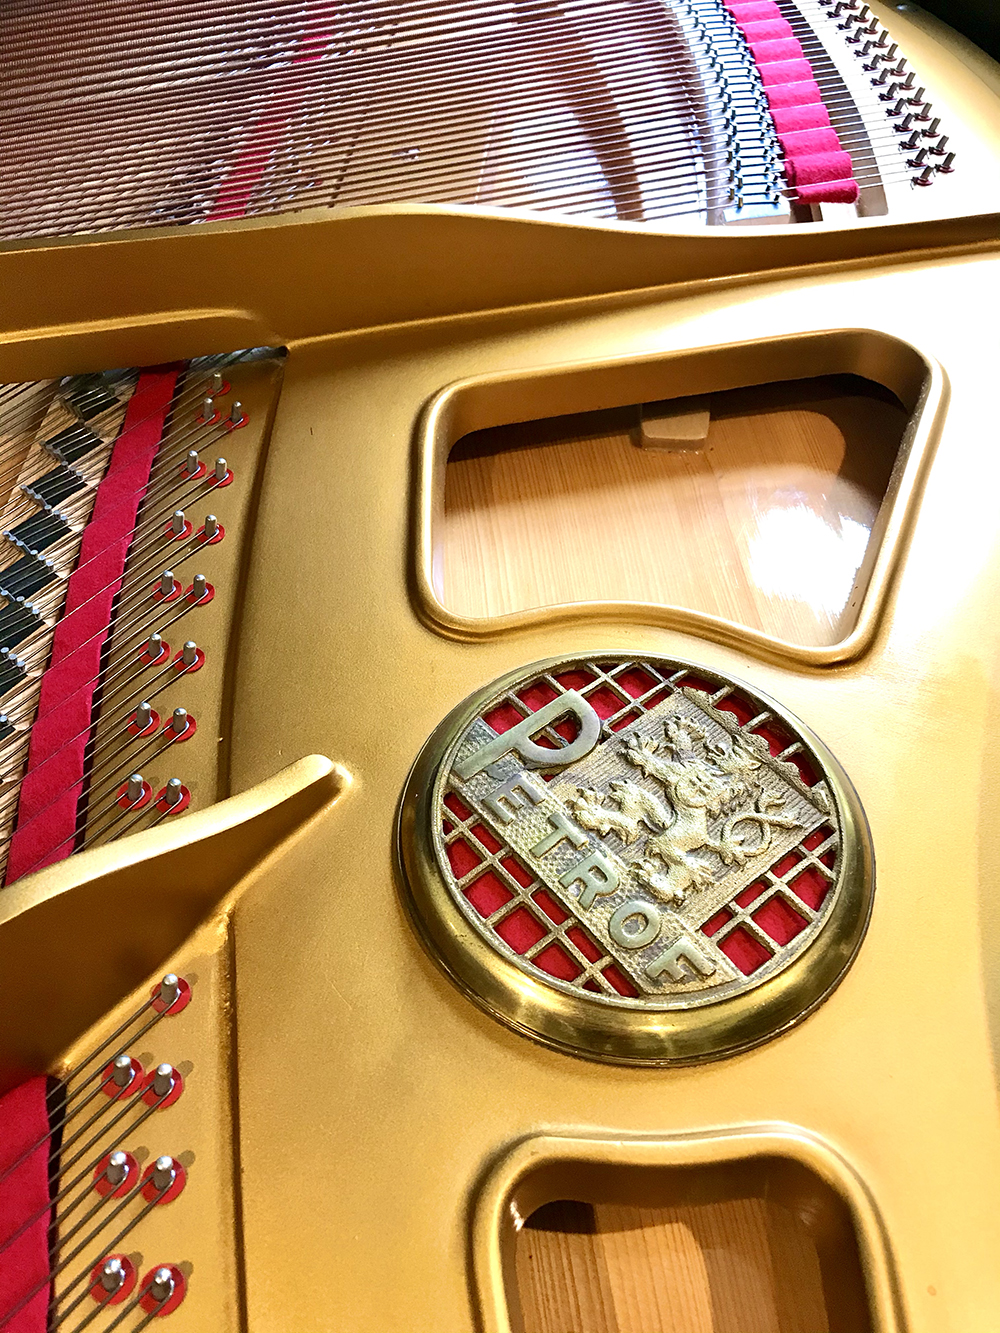 used-petrof-baby-grand-Piano-Dorset-for-sale-2.jpg